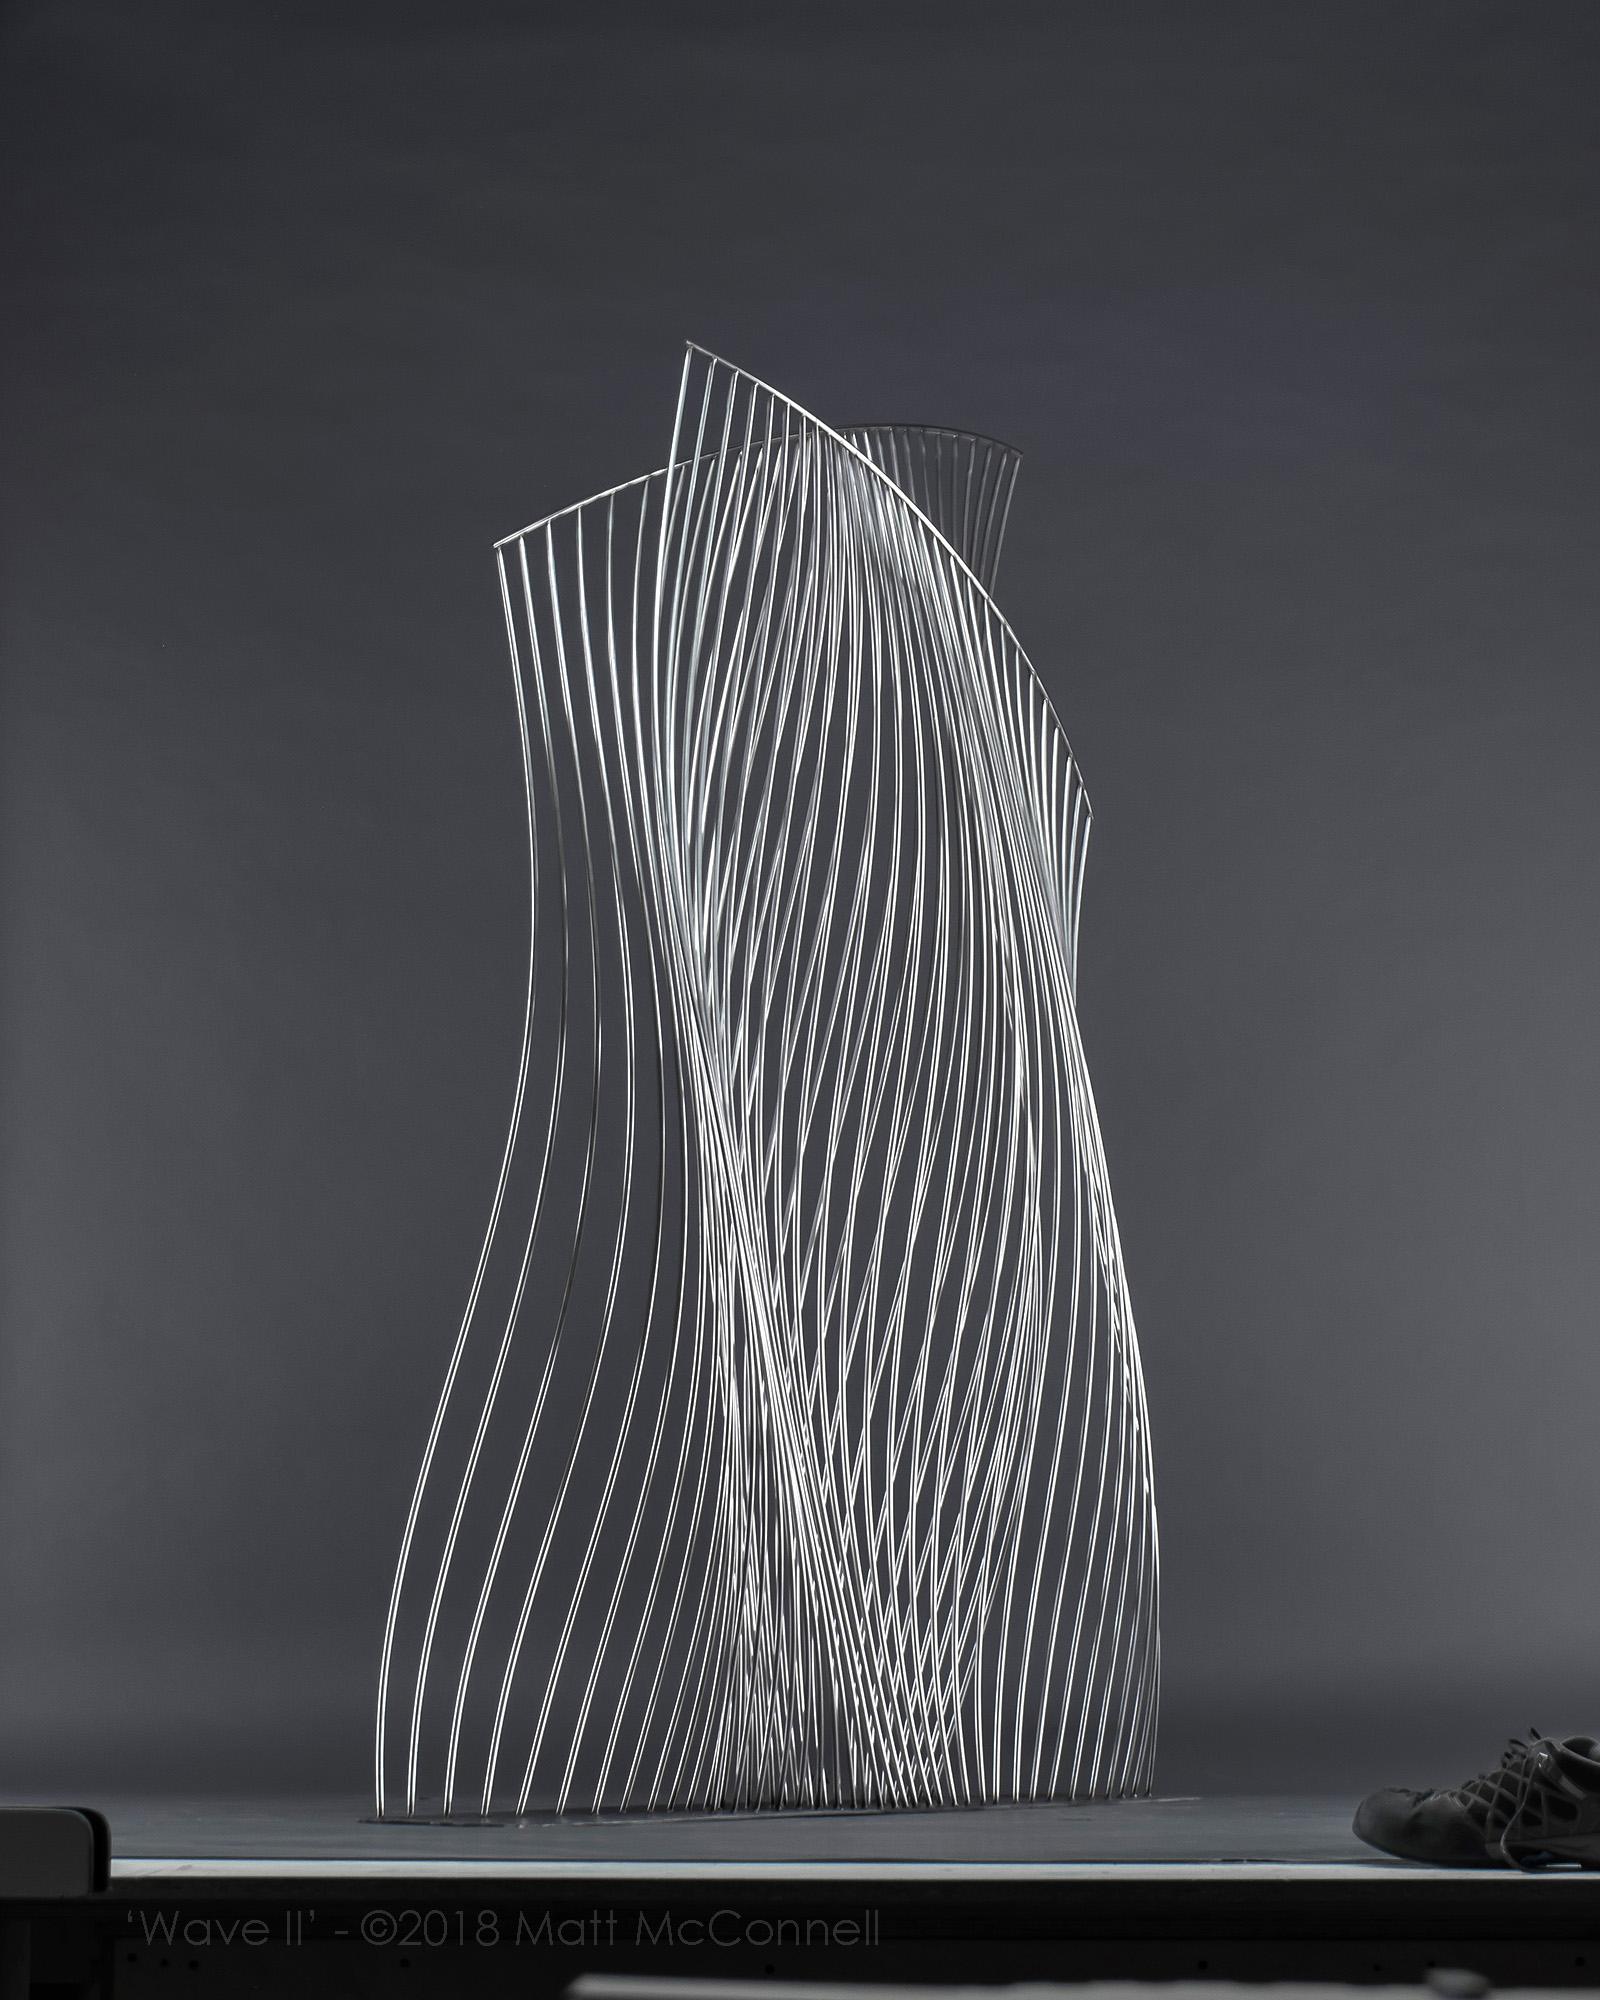 'Wave II'-©2018 Matt McConnell-6.jpg